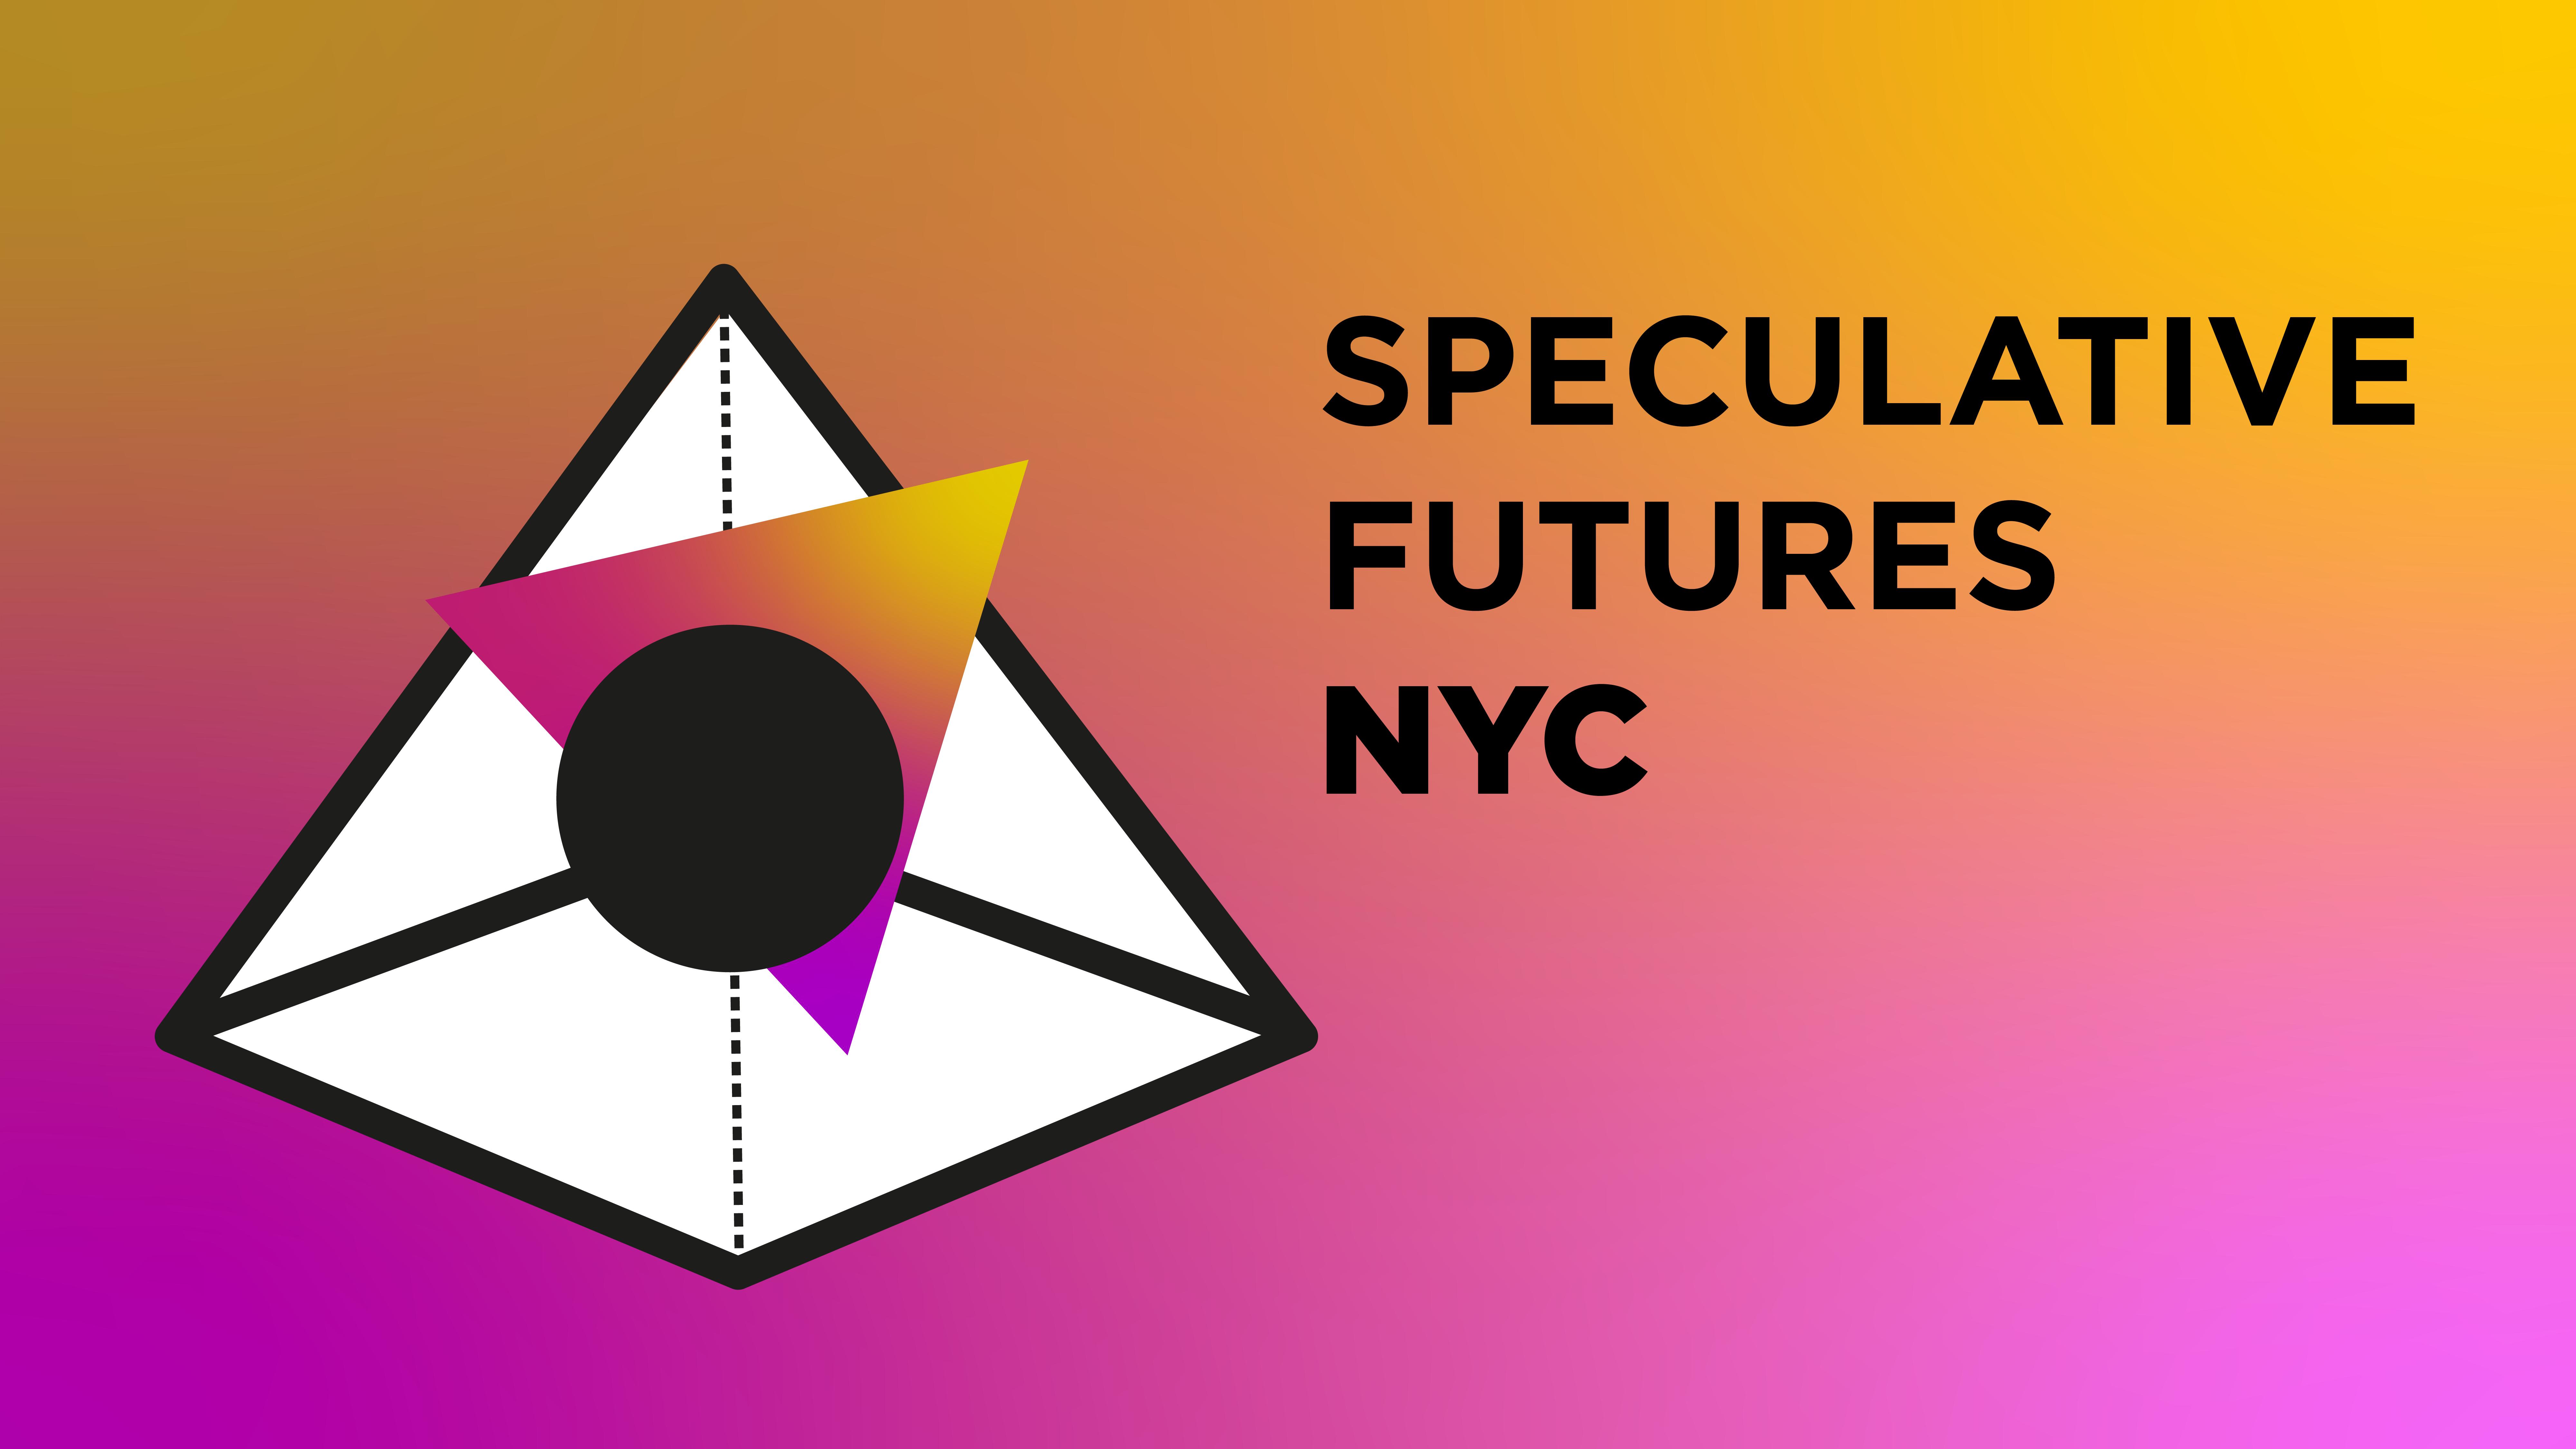 Speculative Futures NYC